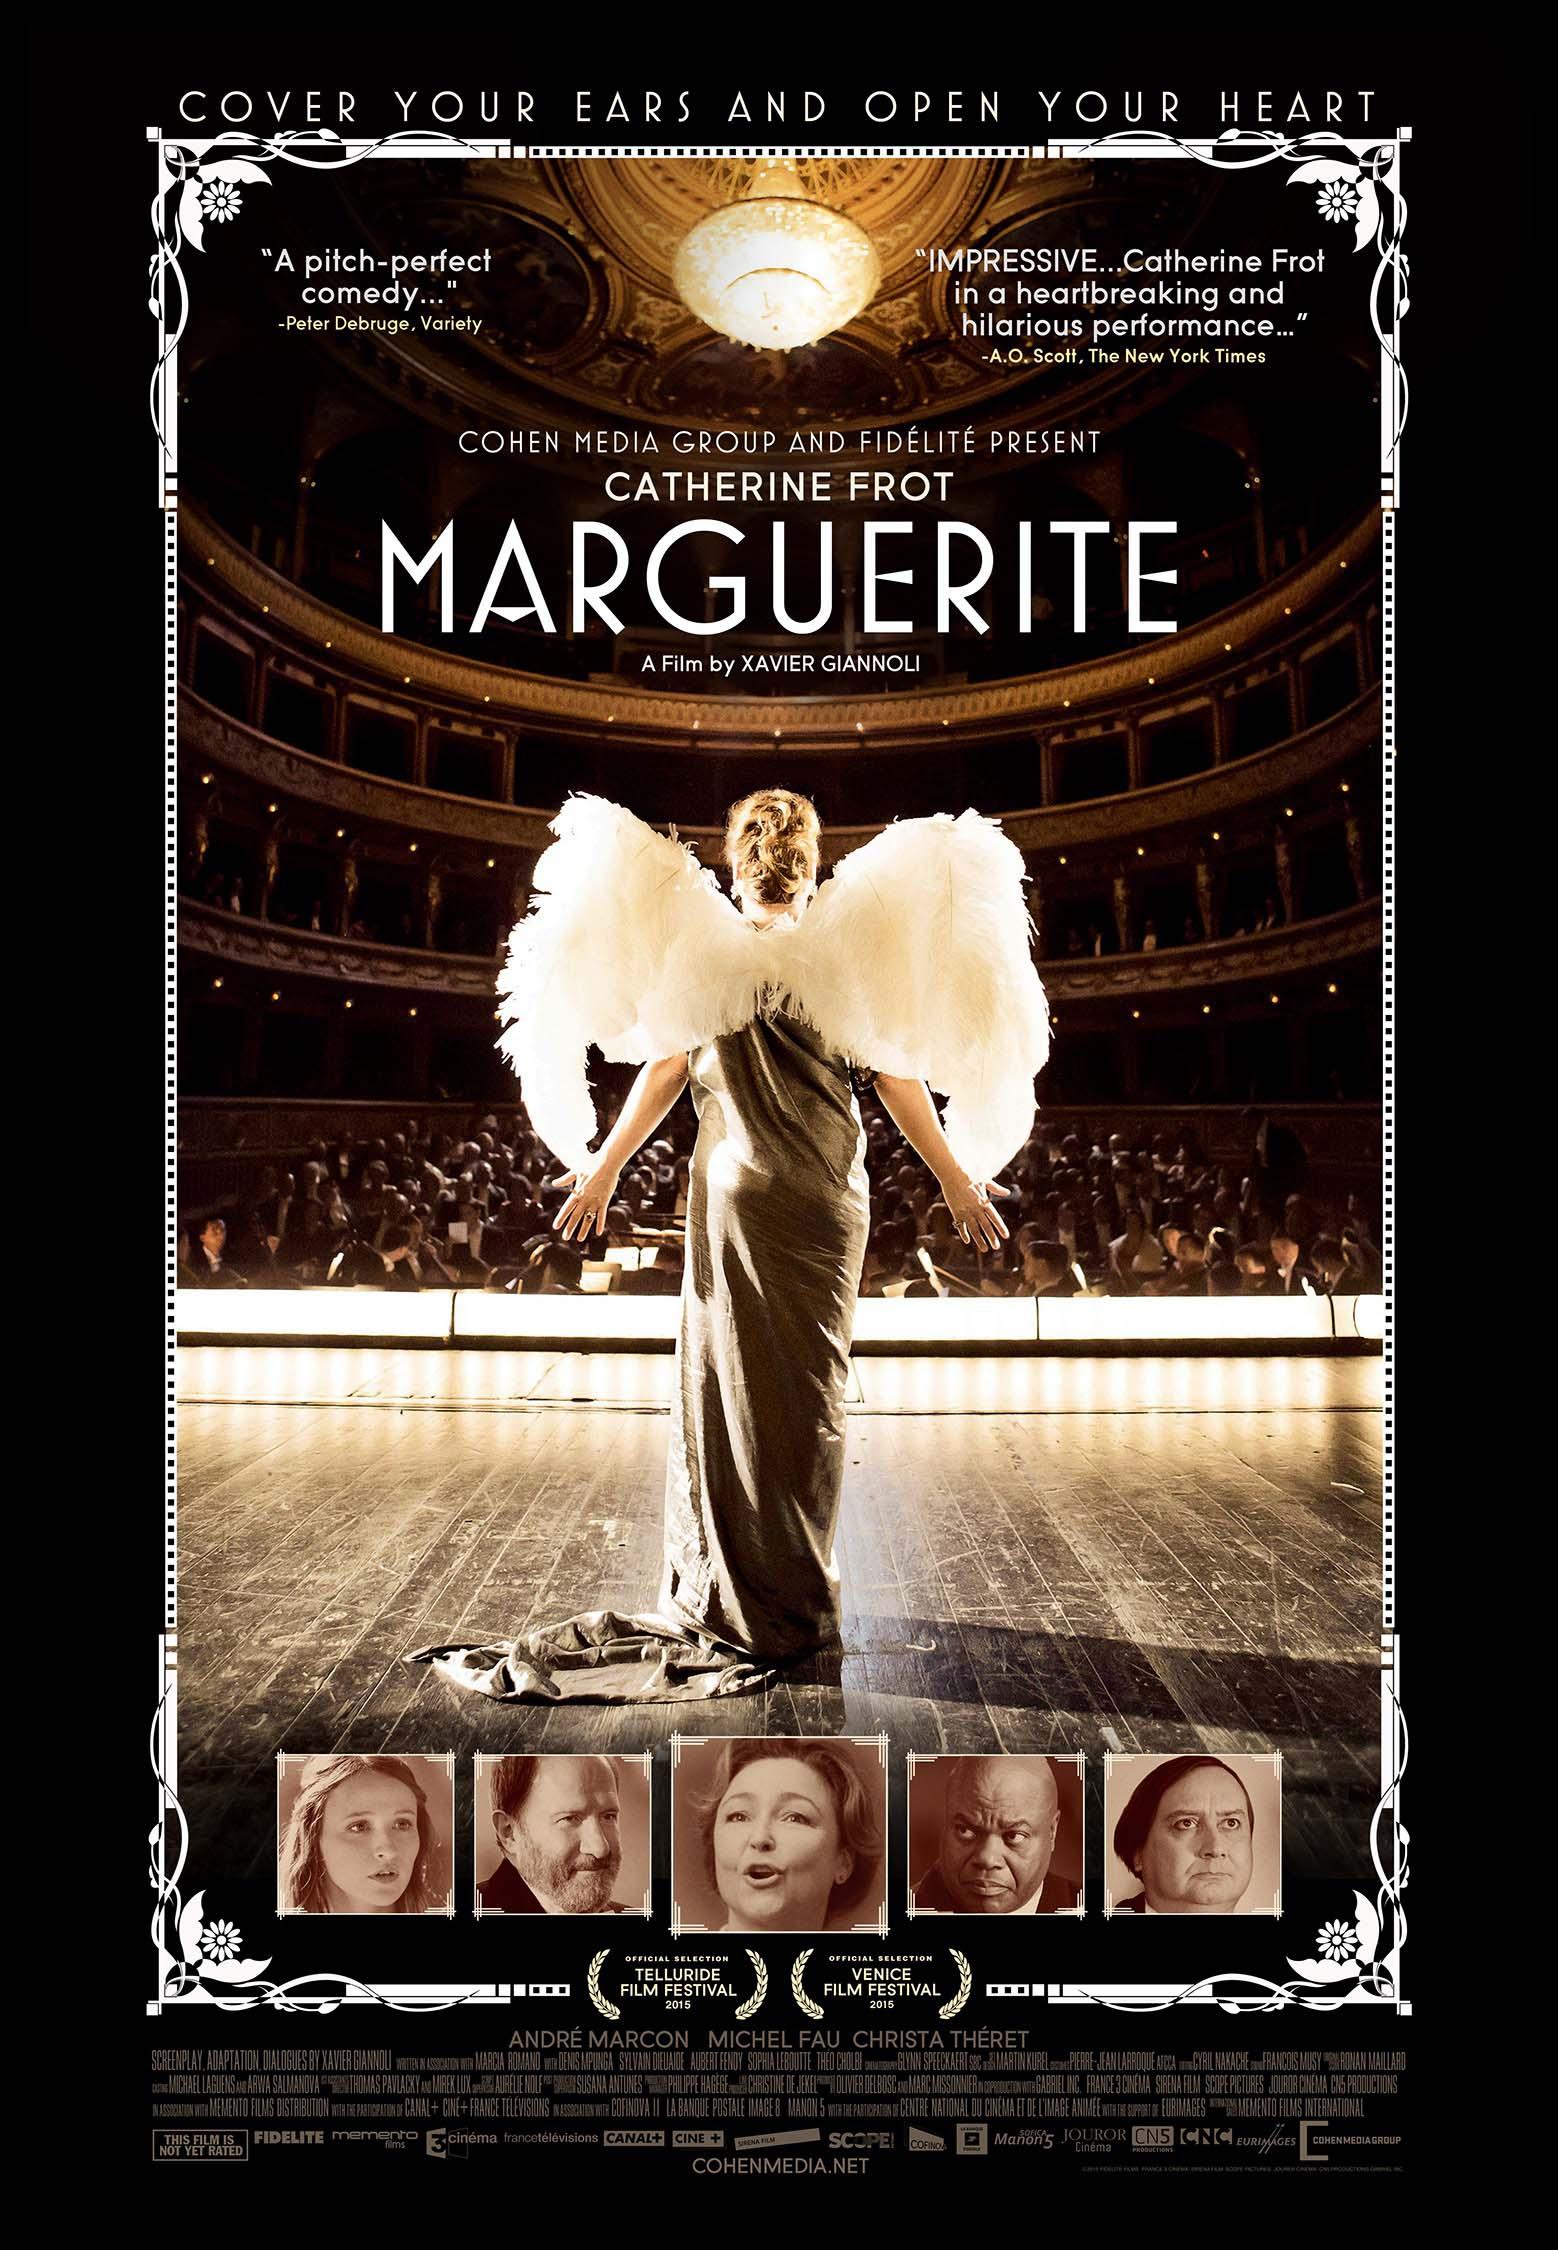 movieposter_marguerite compressed